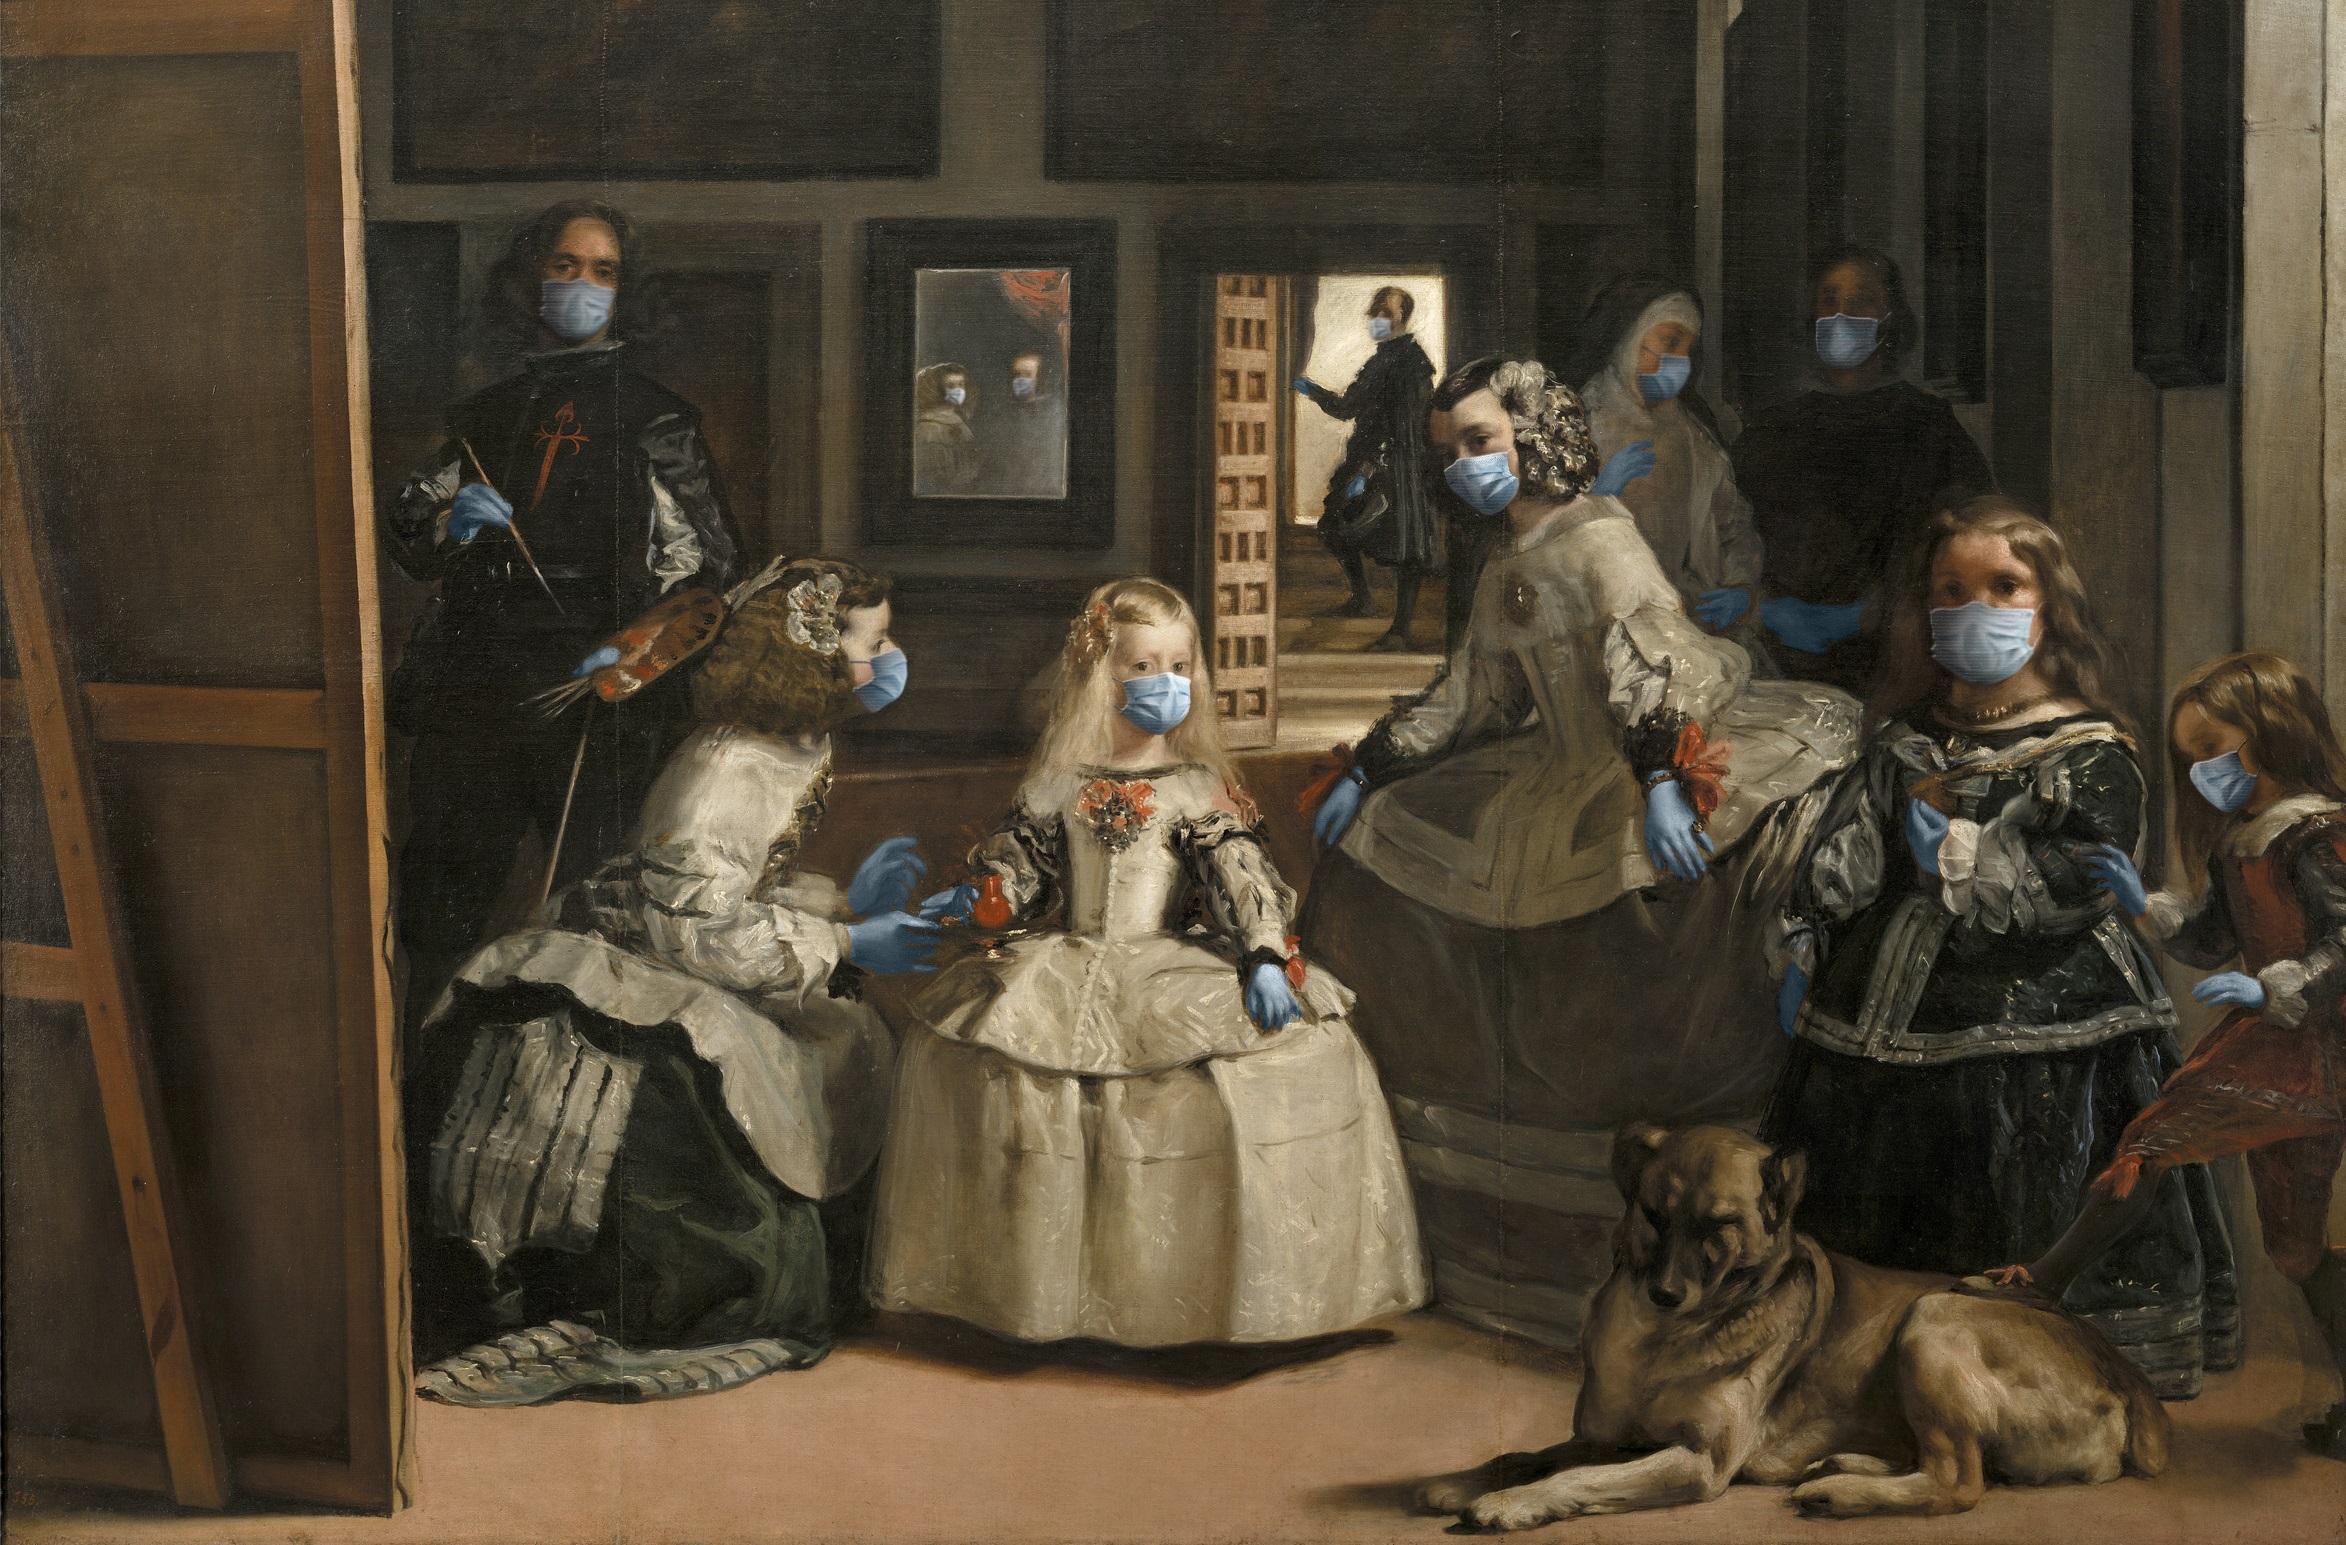 Diego de Velázquez/POA Estudio